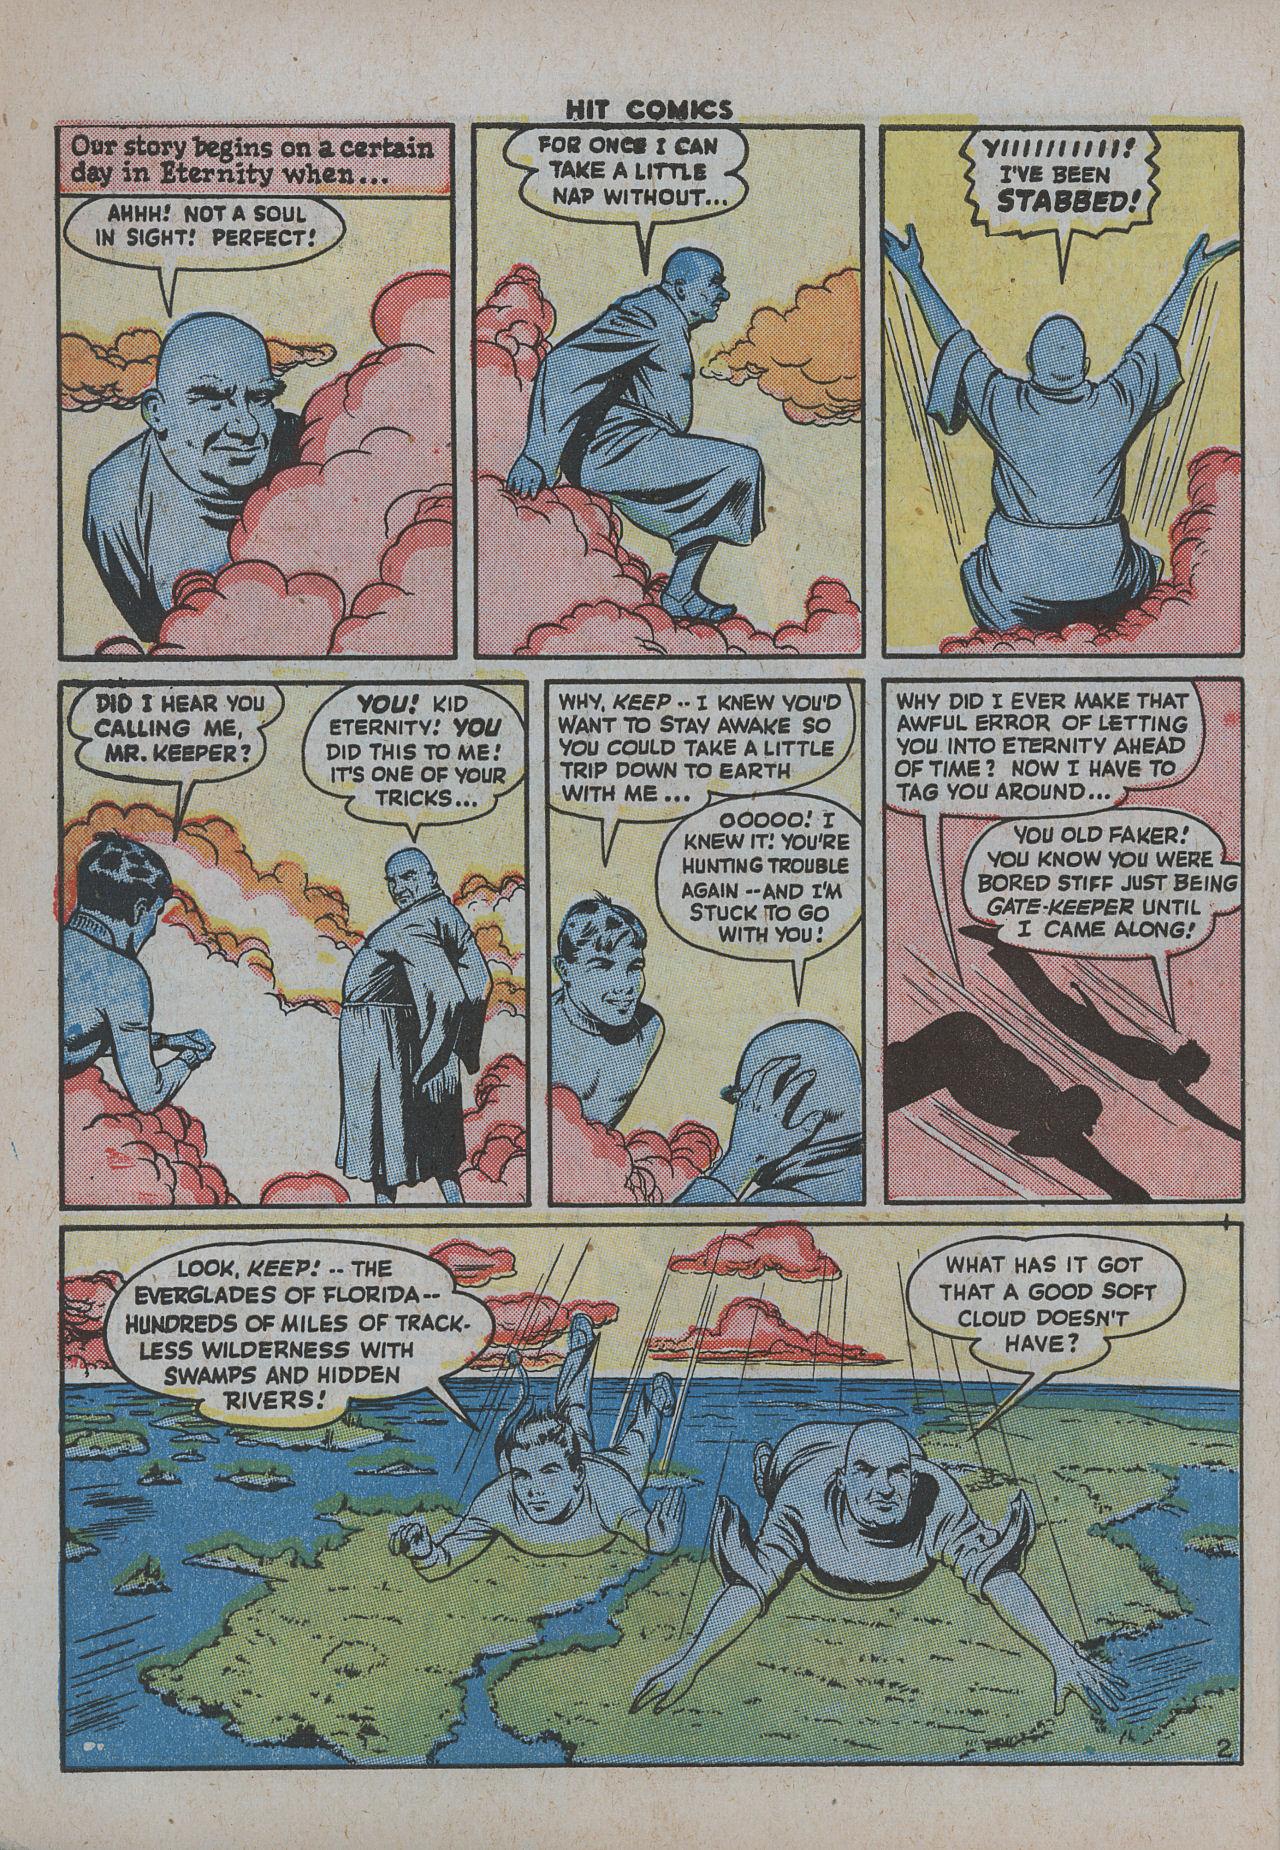 Read online Hit Comics comic -  Issue #38 - 7